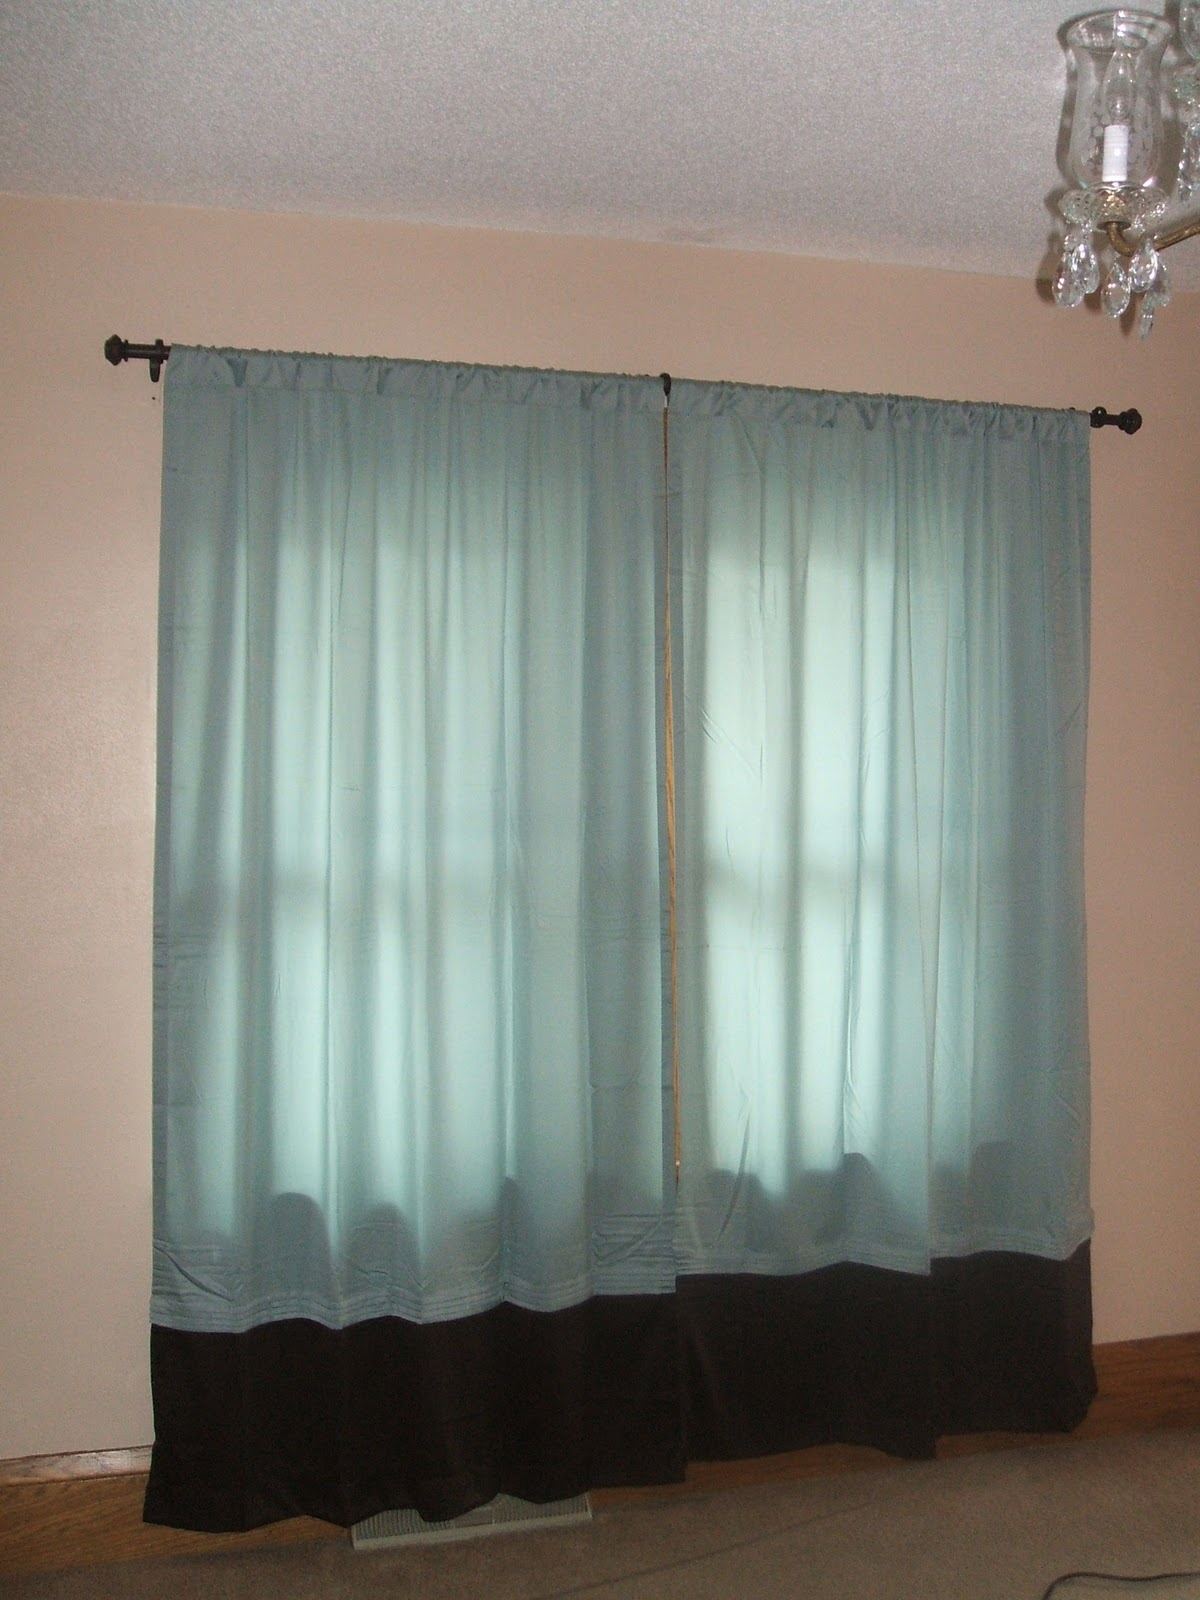 Eclipse Noise Reducing Curtains Review Curtain Menzilperde Net